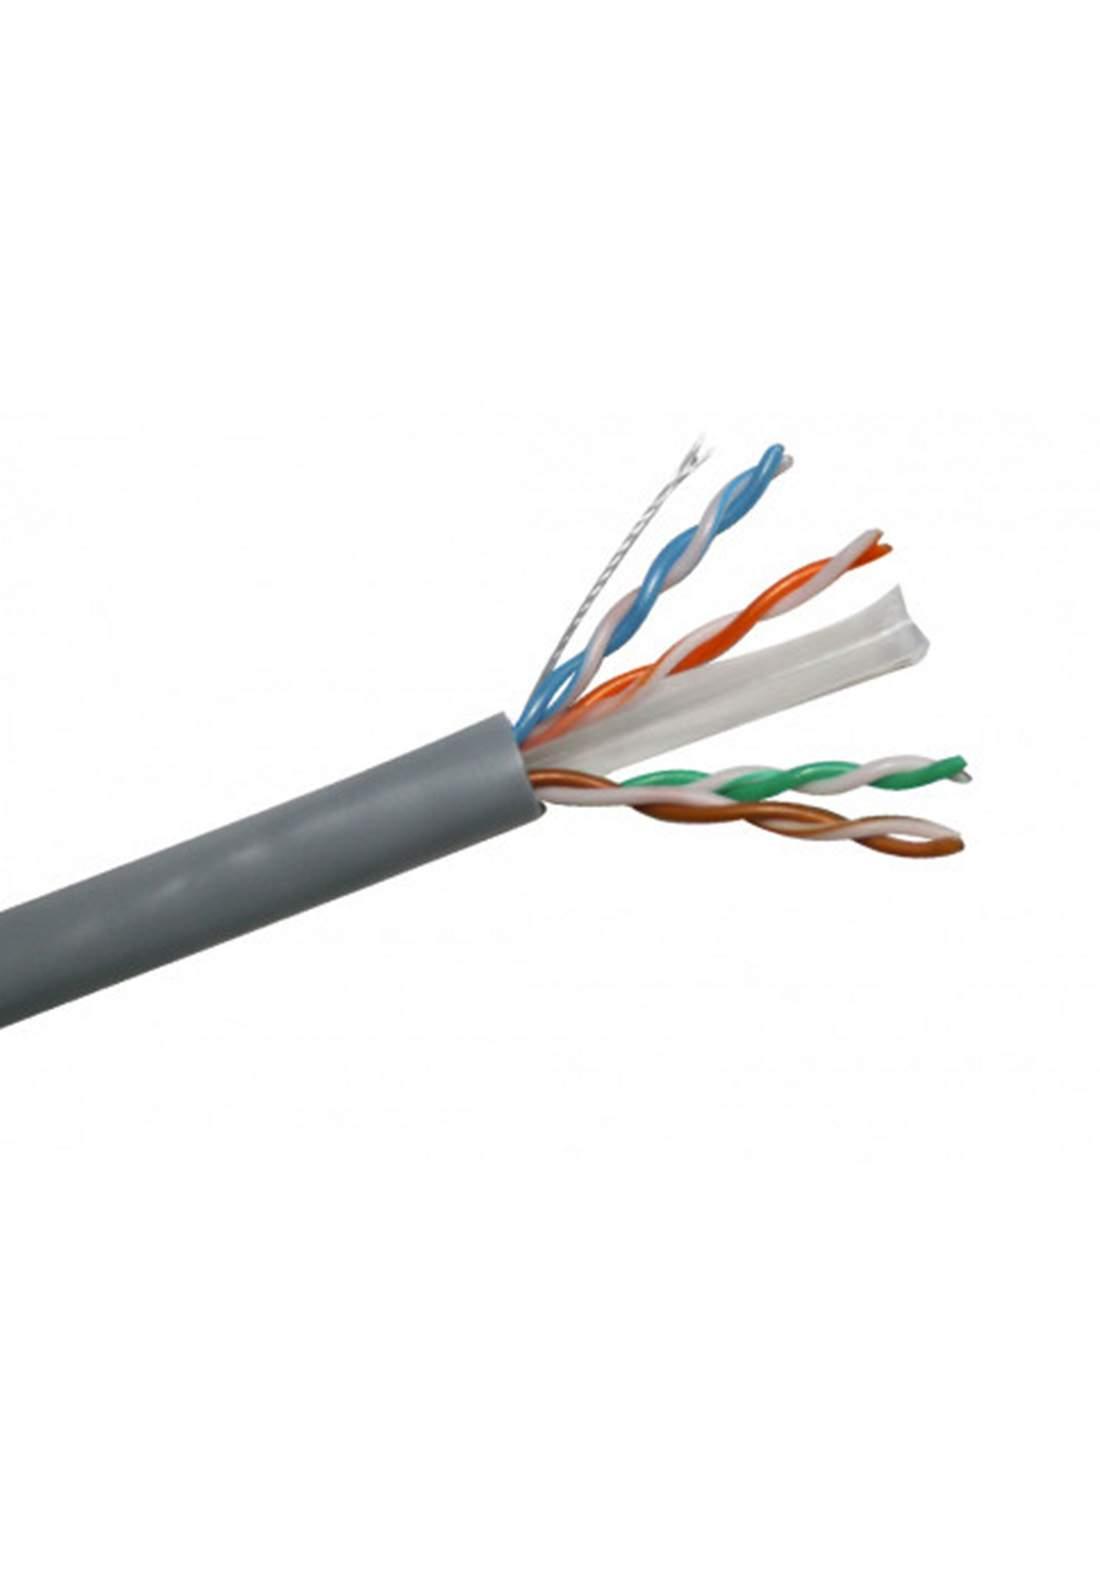 Aico Cat6 Lan Cable 30m - Black كابل ايثرنت